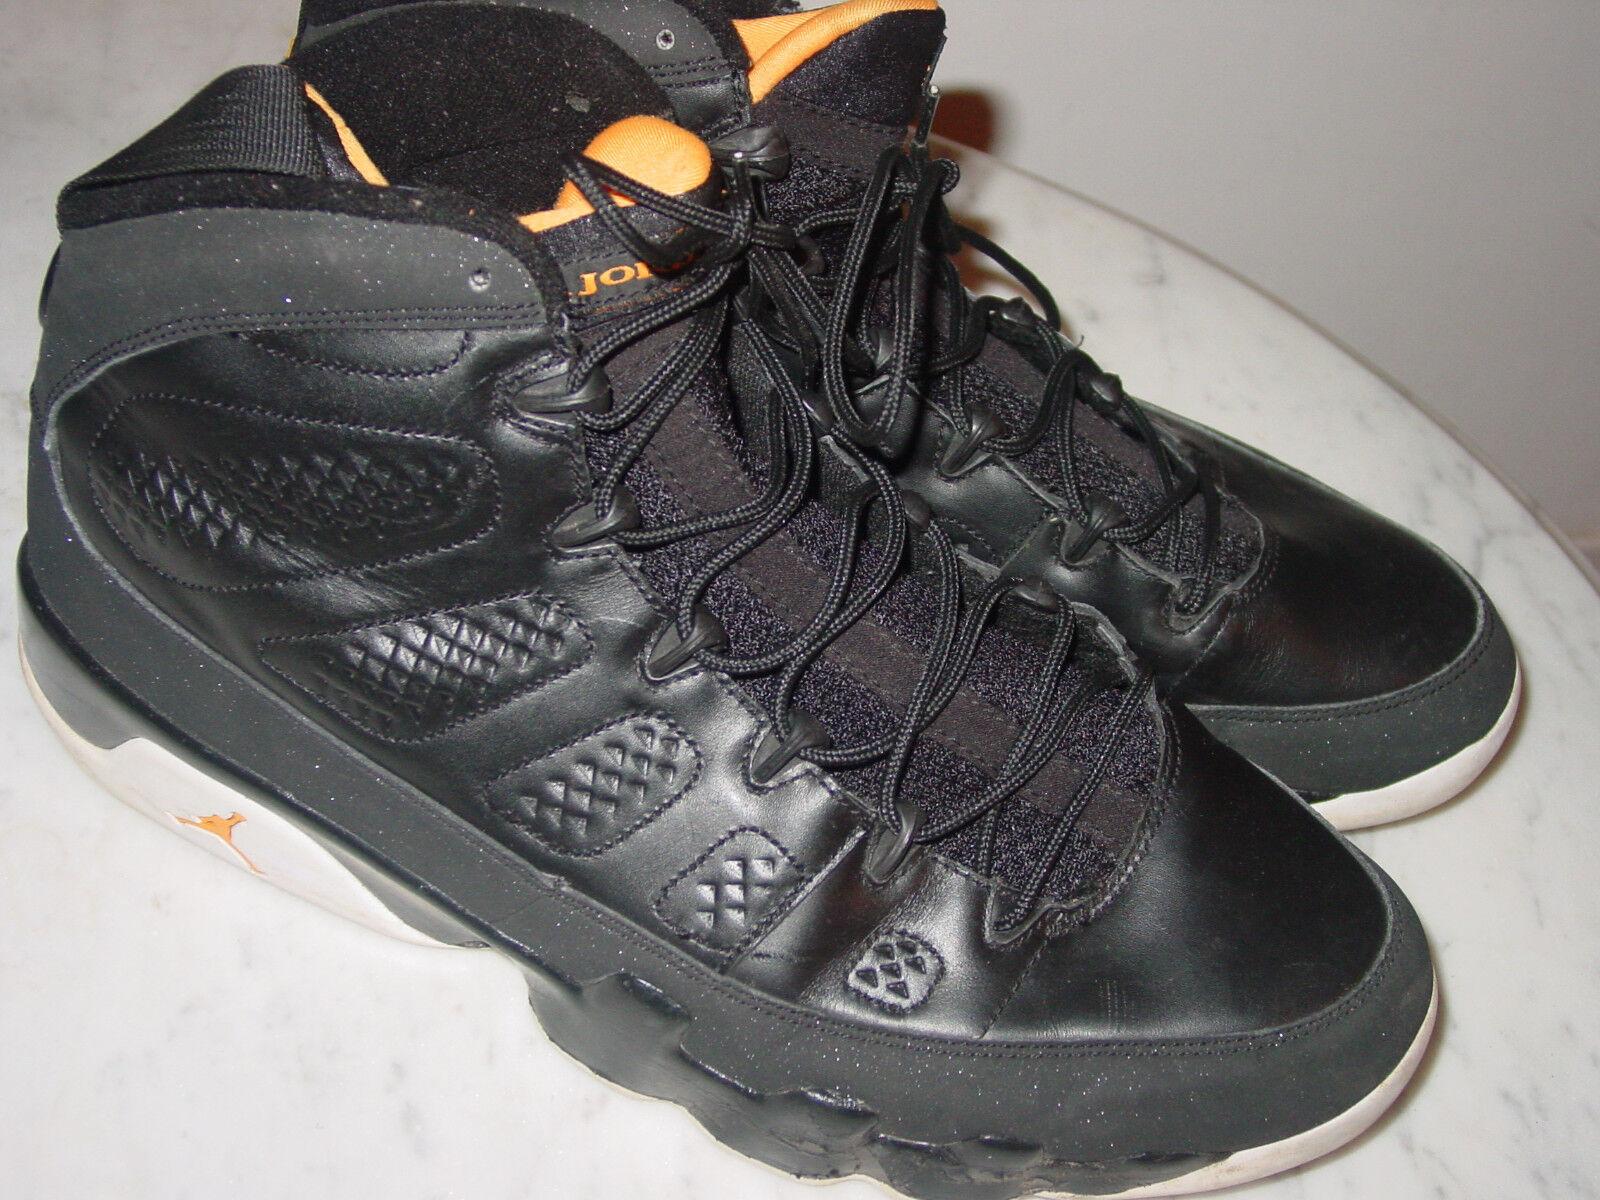 2018 Nike Air Jordan Retro 9 Black/Citrus/White Basketball Shoes! Size 13